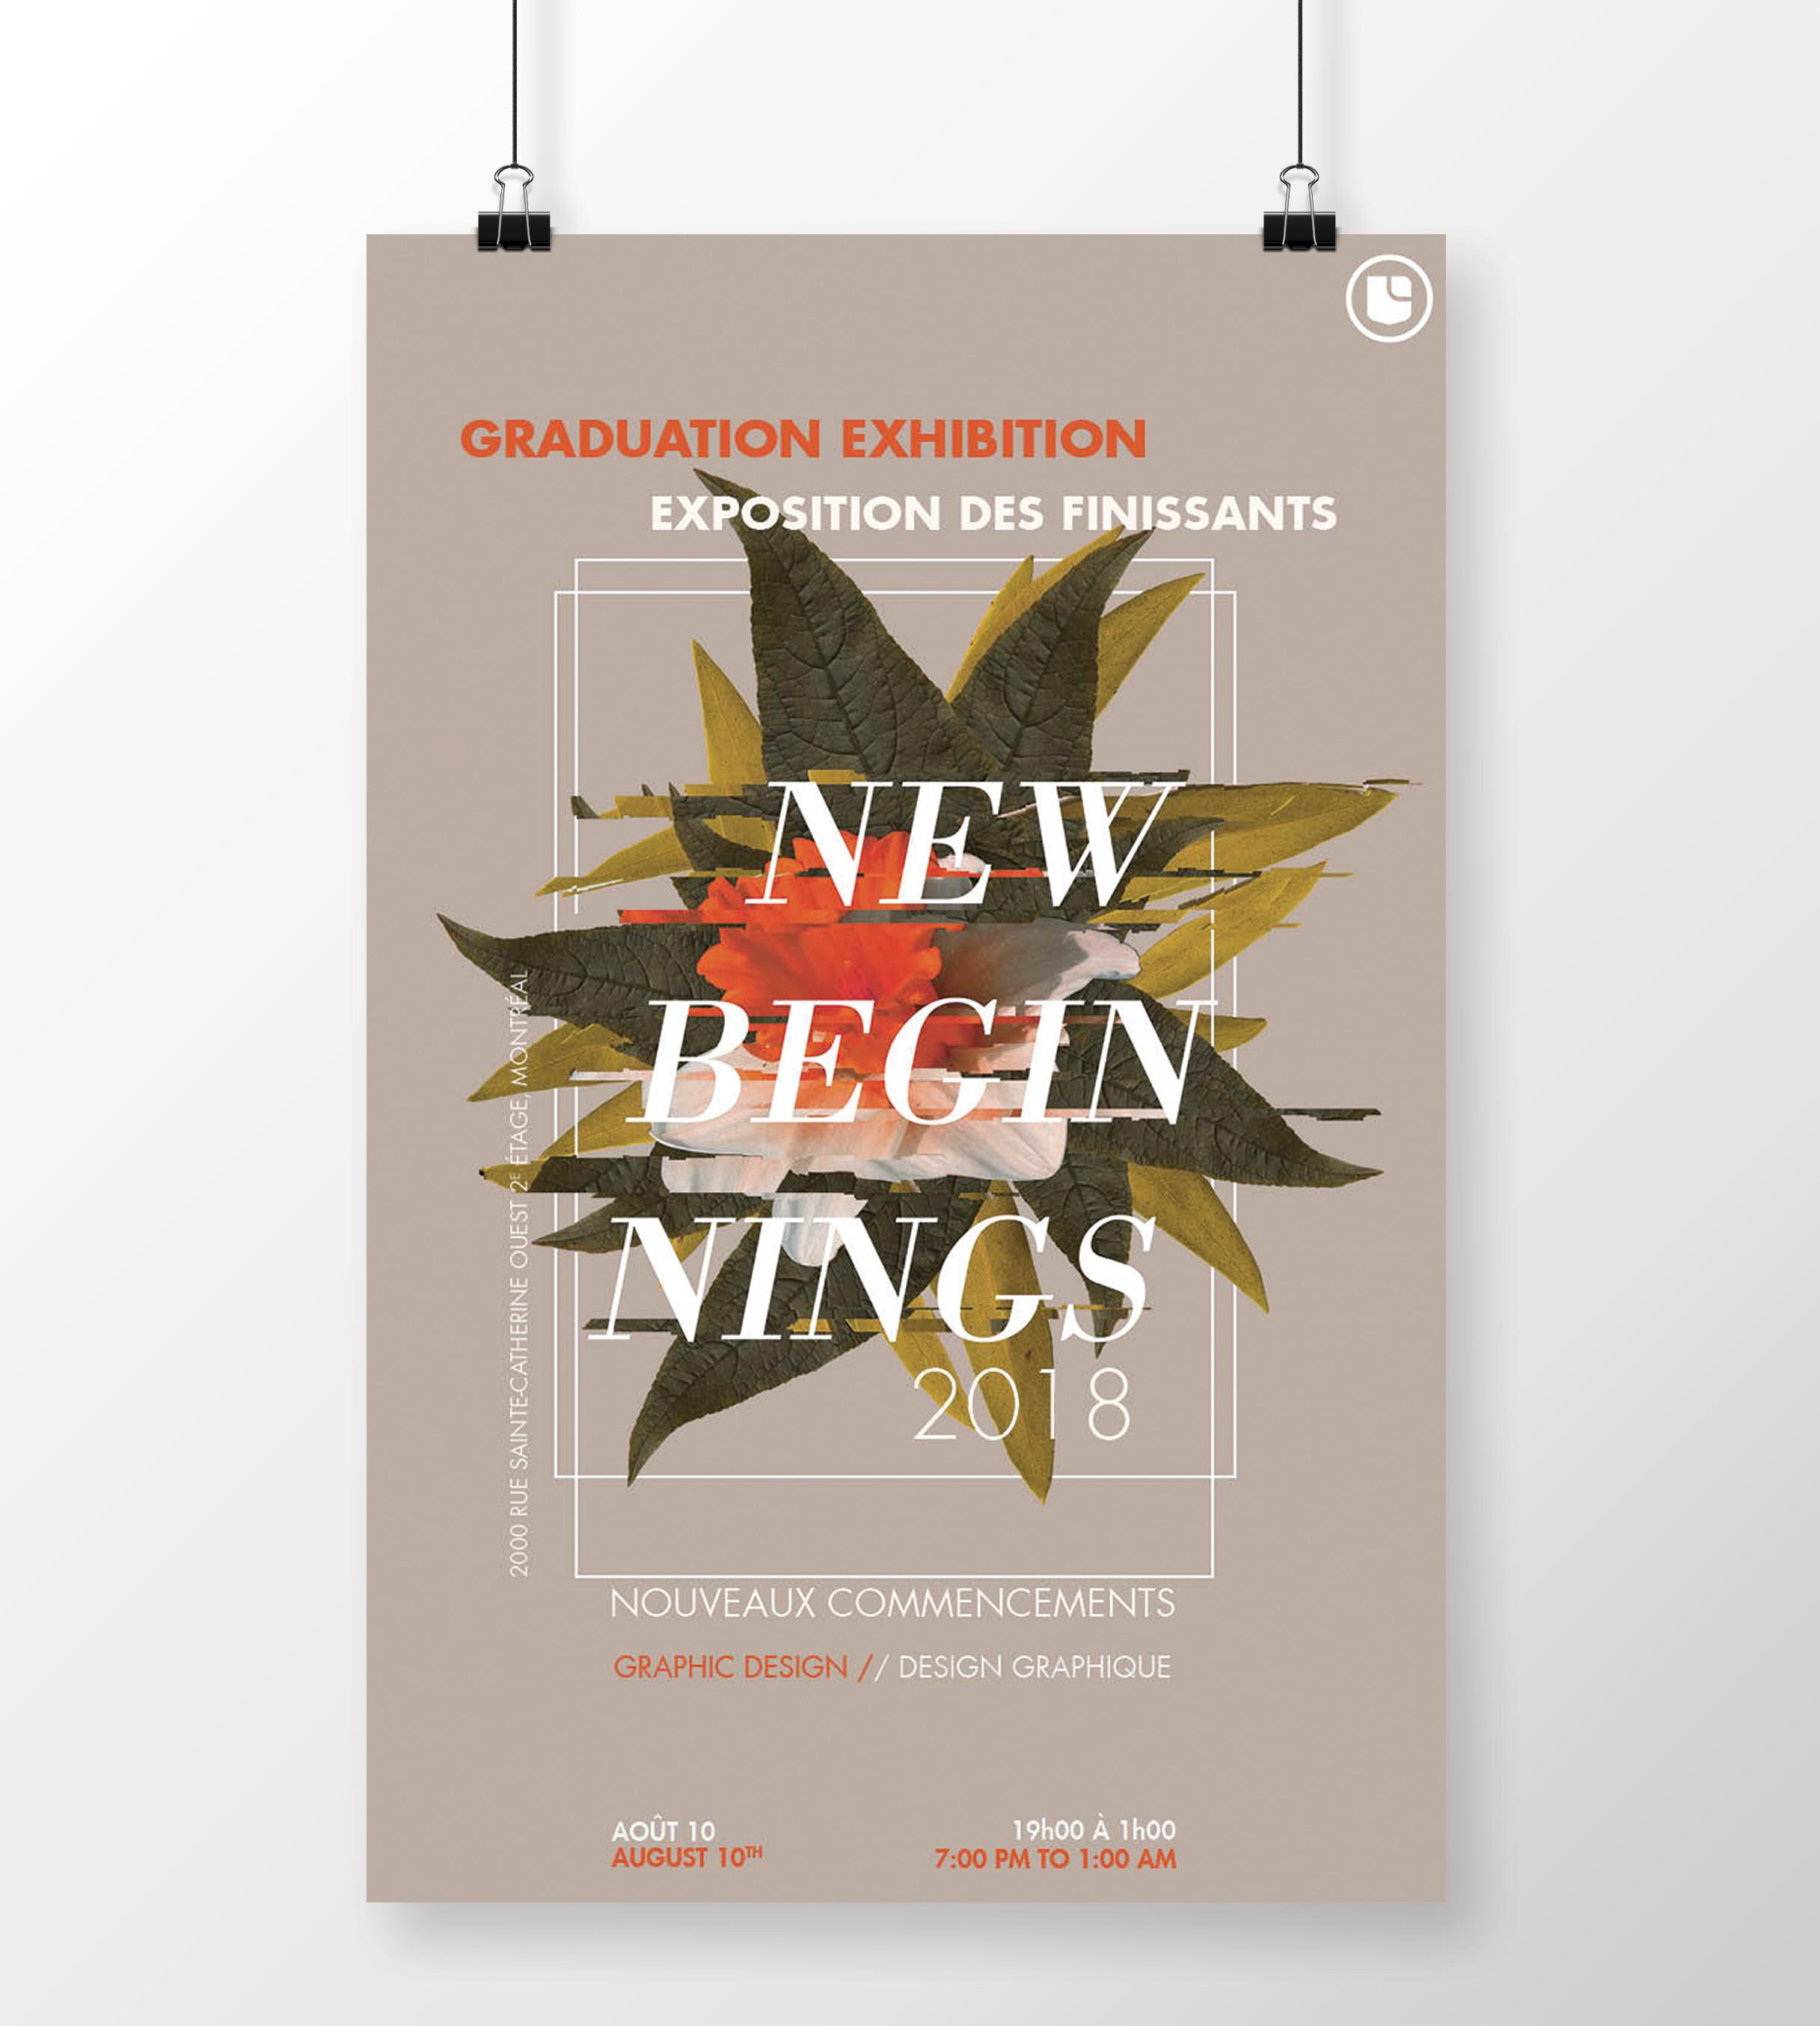 vernissage-graphic-design